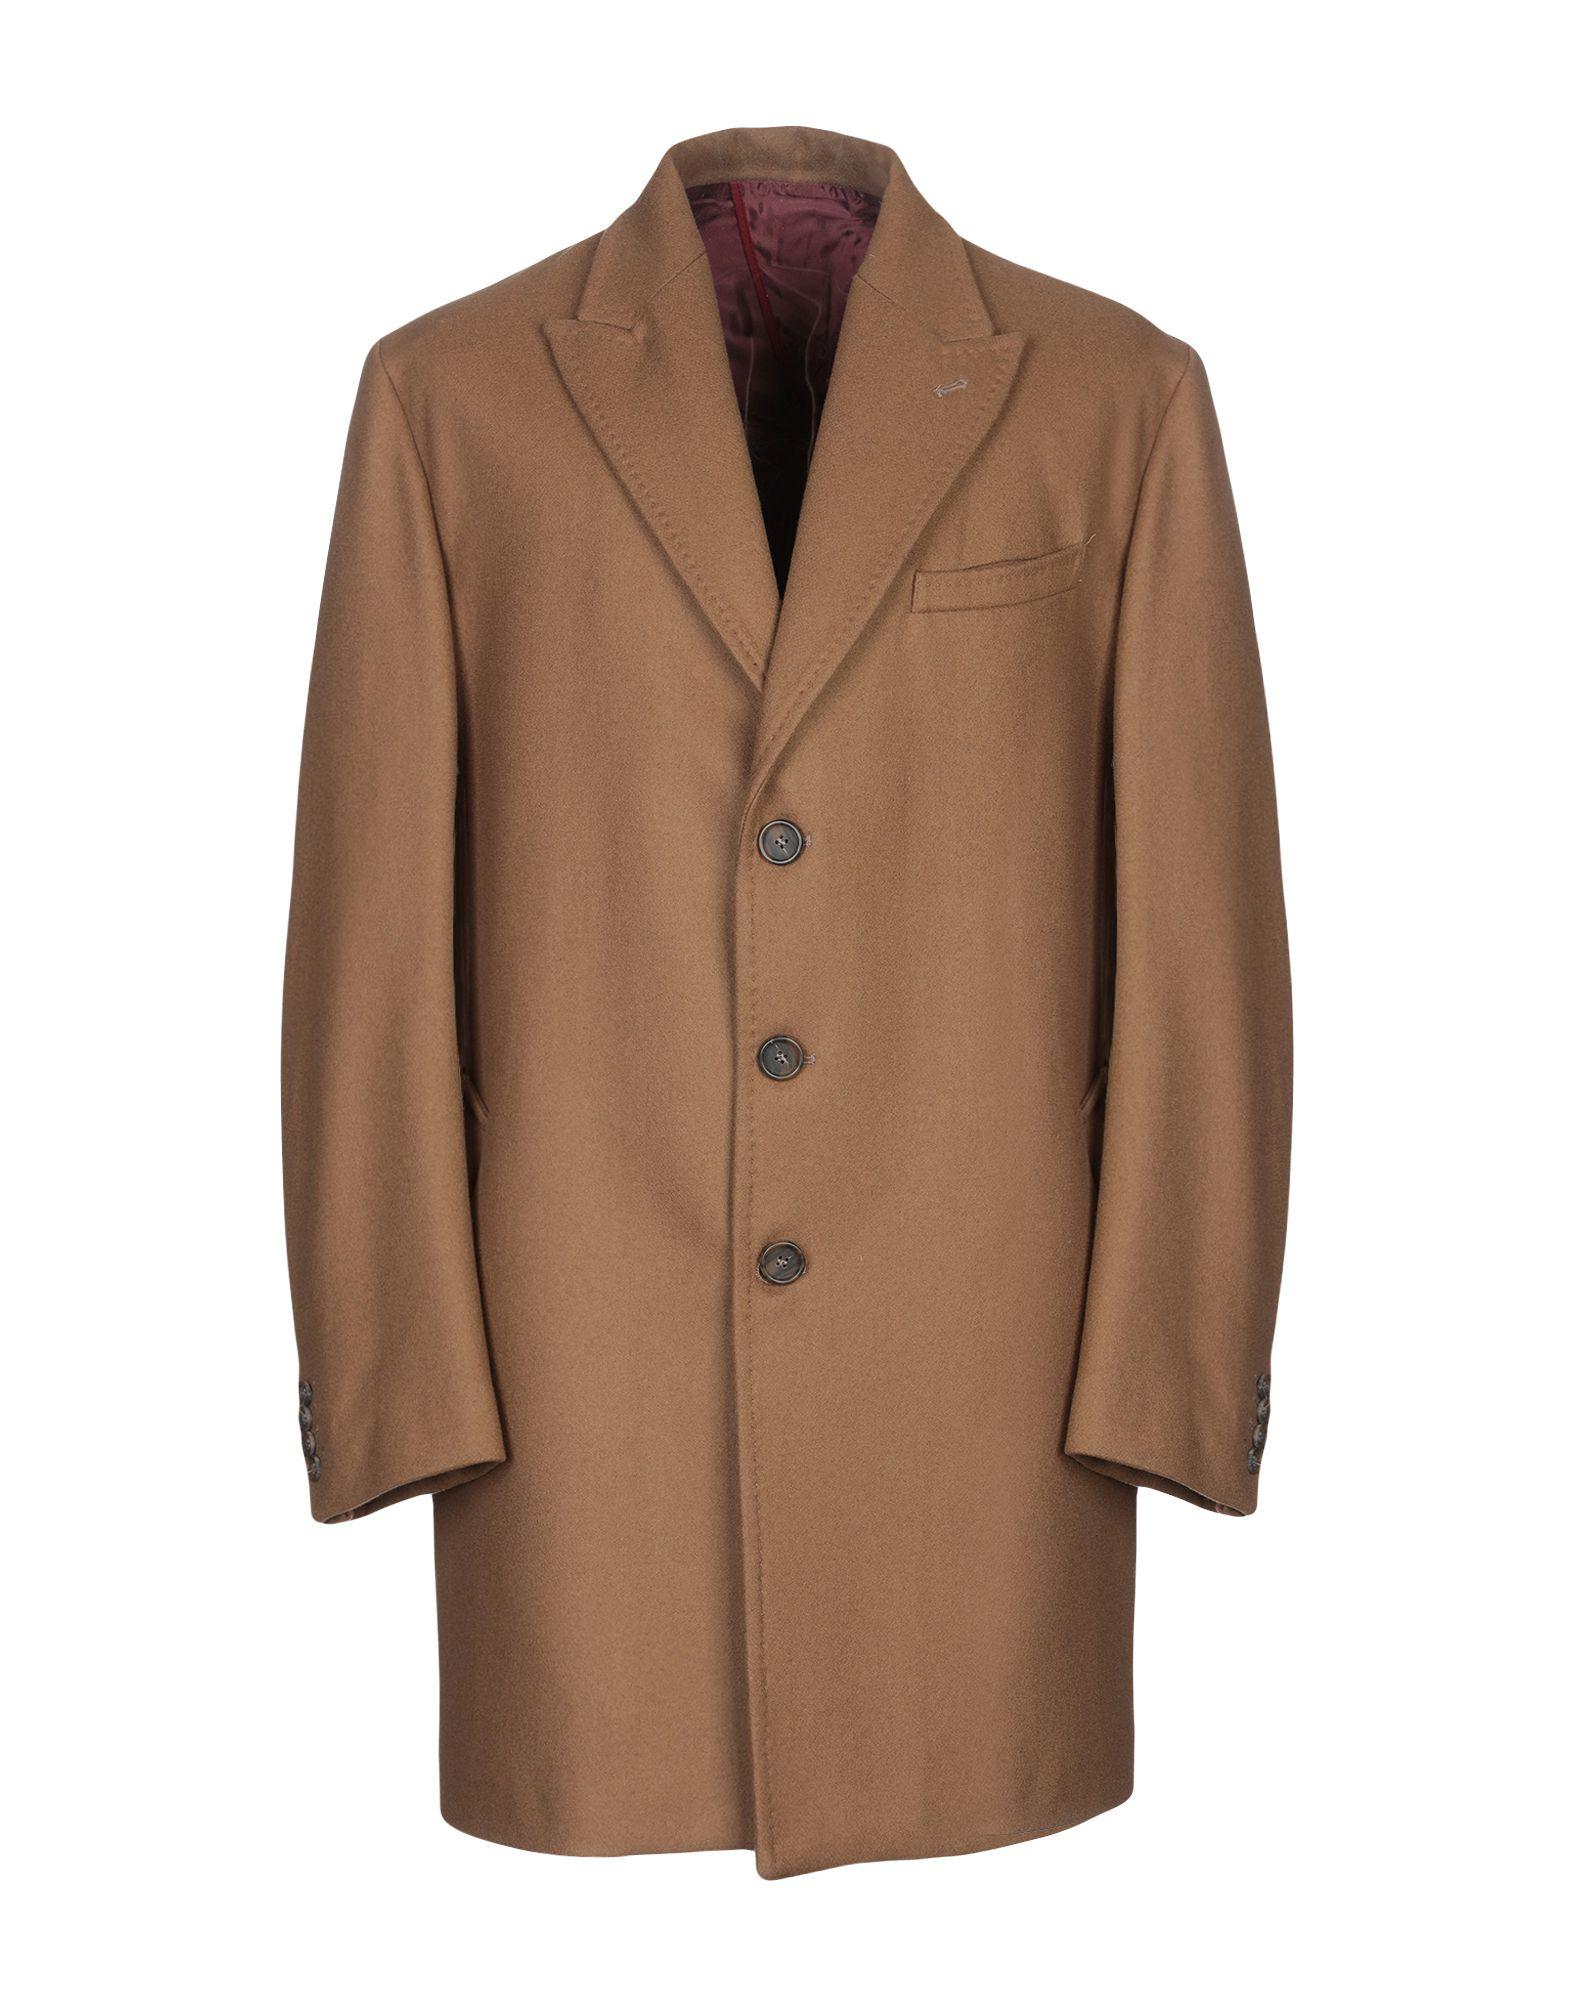 JHEY ROGER Coats - Item 41853014